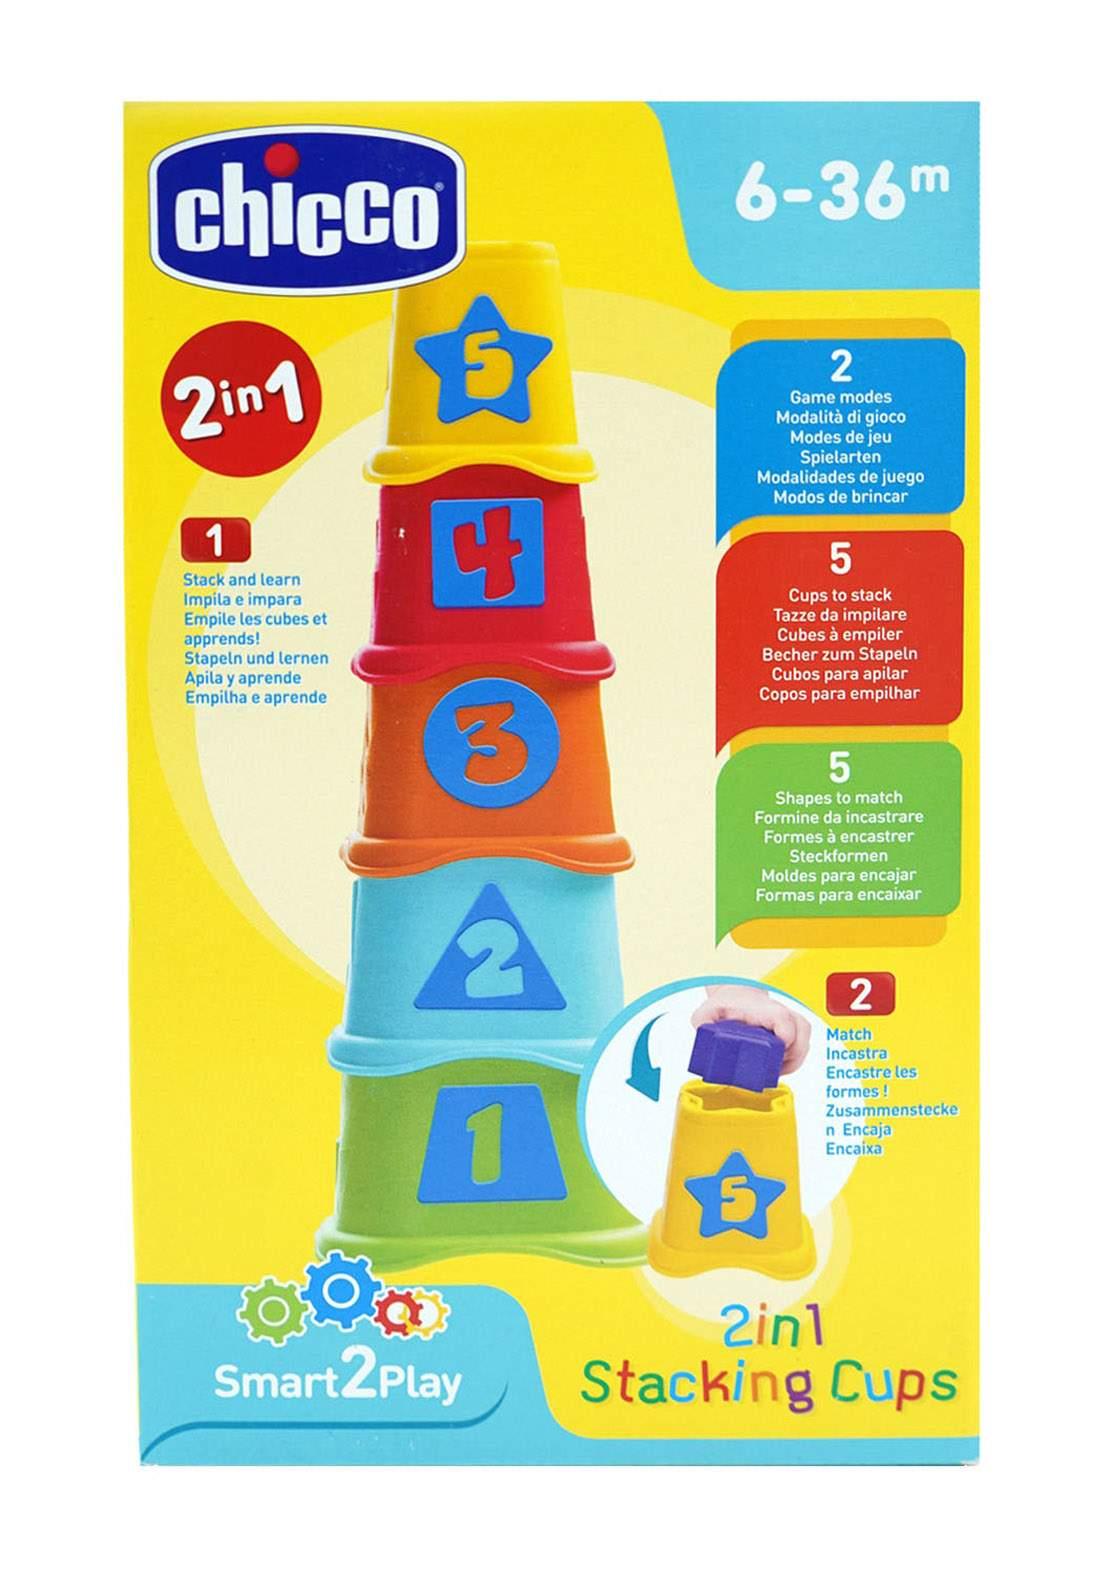 Chicco Classis 2 in 1 Smart 2 Play (6-36m) لعبة تكديس الأكواب للأطفال